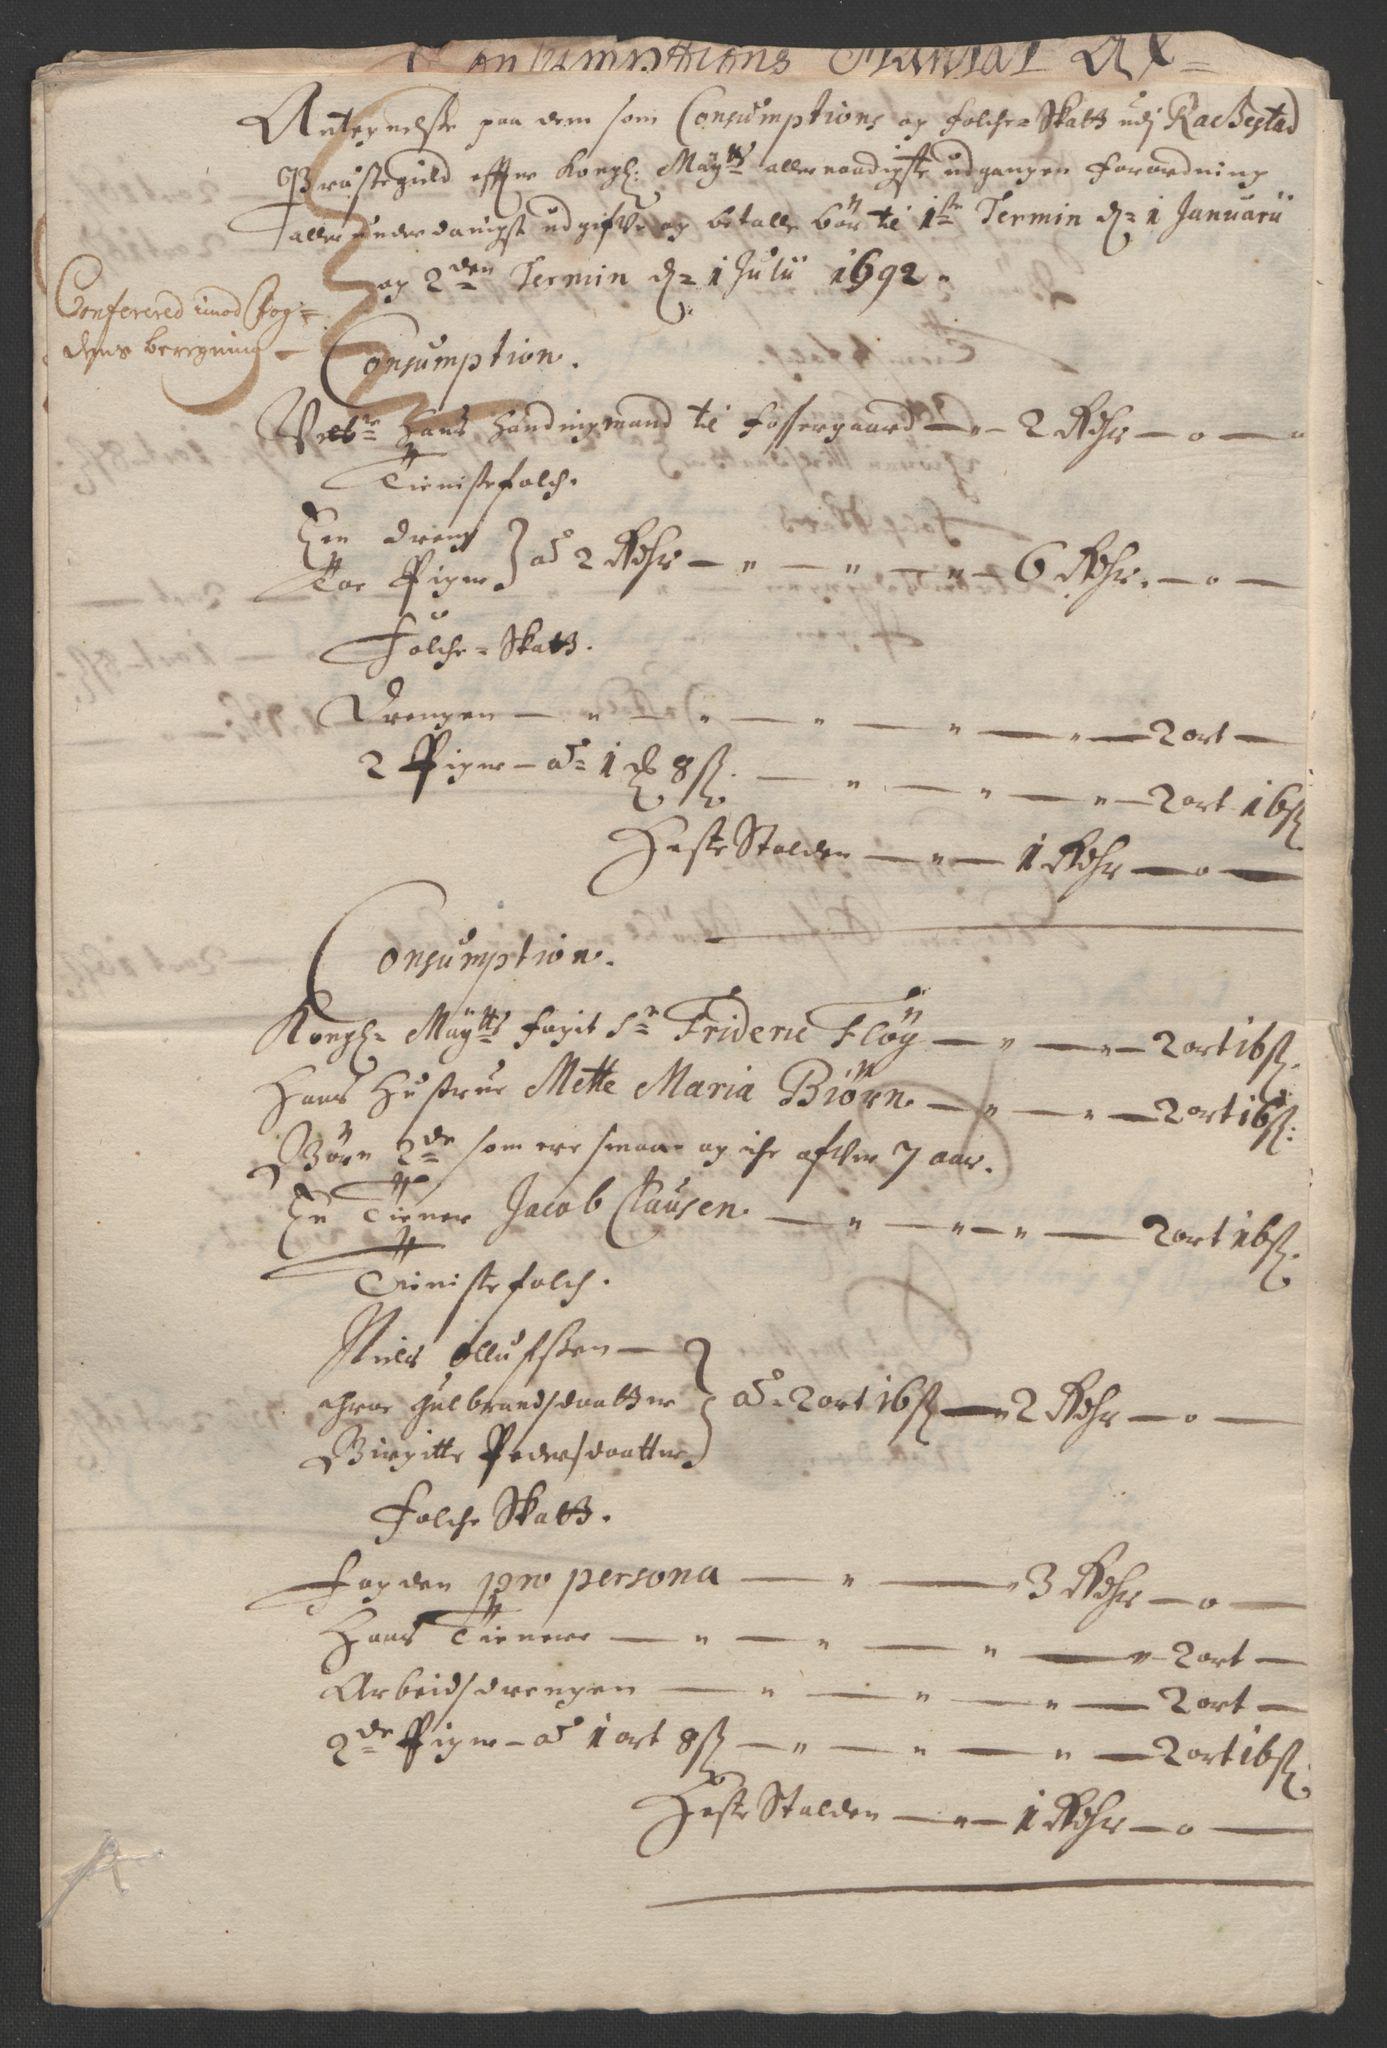 RA, Rentekammeret inntil 1814, Reviderte regnskaper, Fogderegnskap, R05/L0278: Fogderegnskap Rakkestad, 1691-1693, s. 288